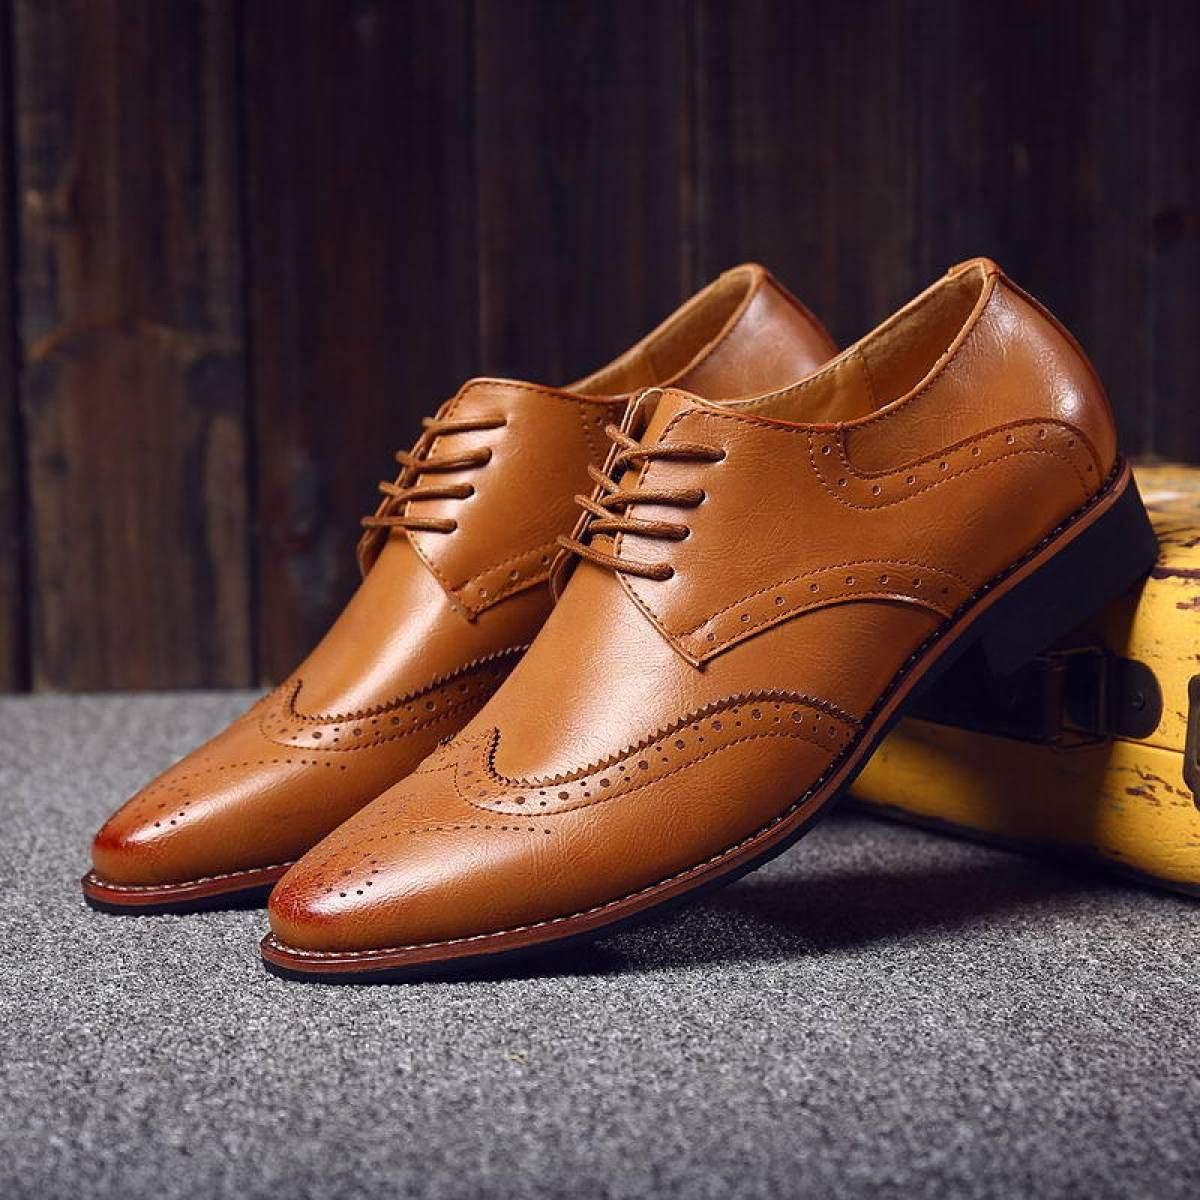 Männer Business Casual Schuhe Herrenschuhe Herrenschuhe Herrenschuhe Block Schuhe Niedrig Zu Helfen Lace Casual Schuhe 2c75ea